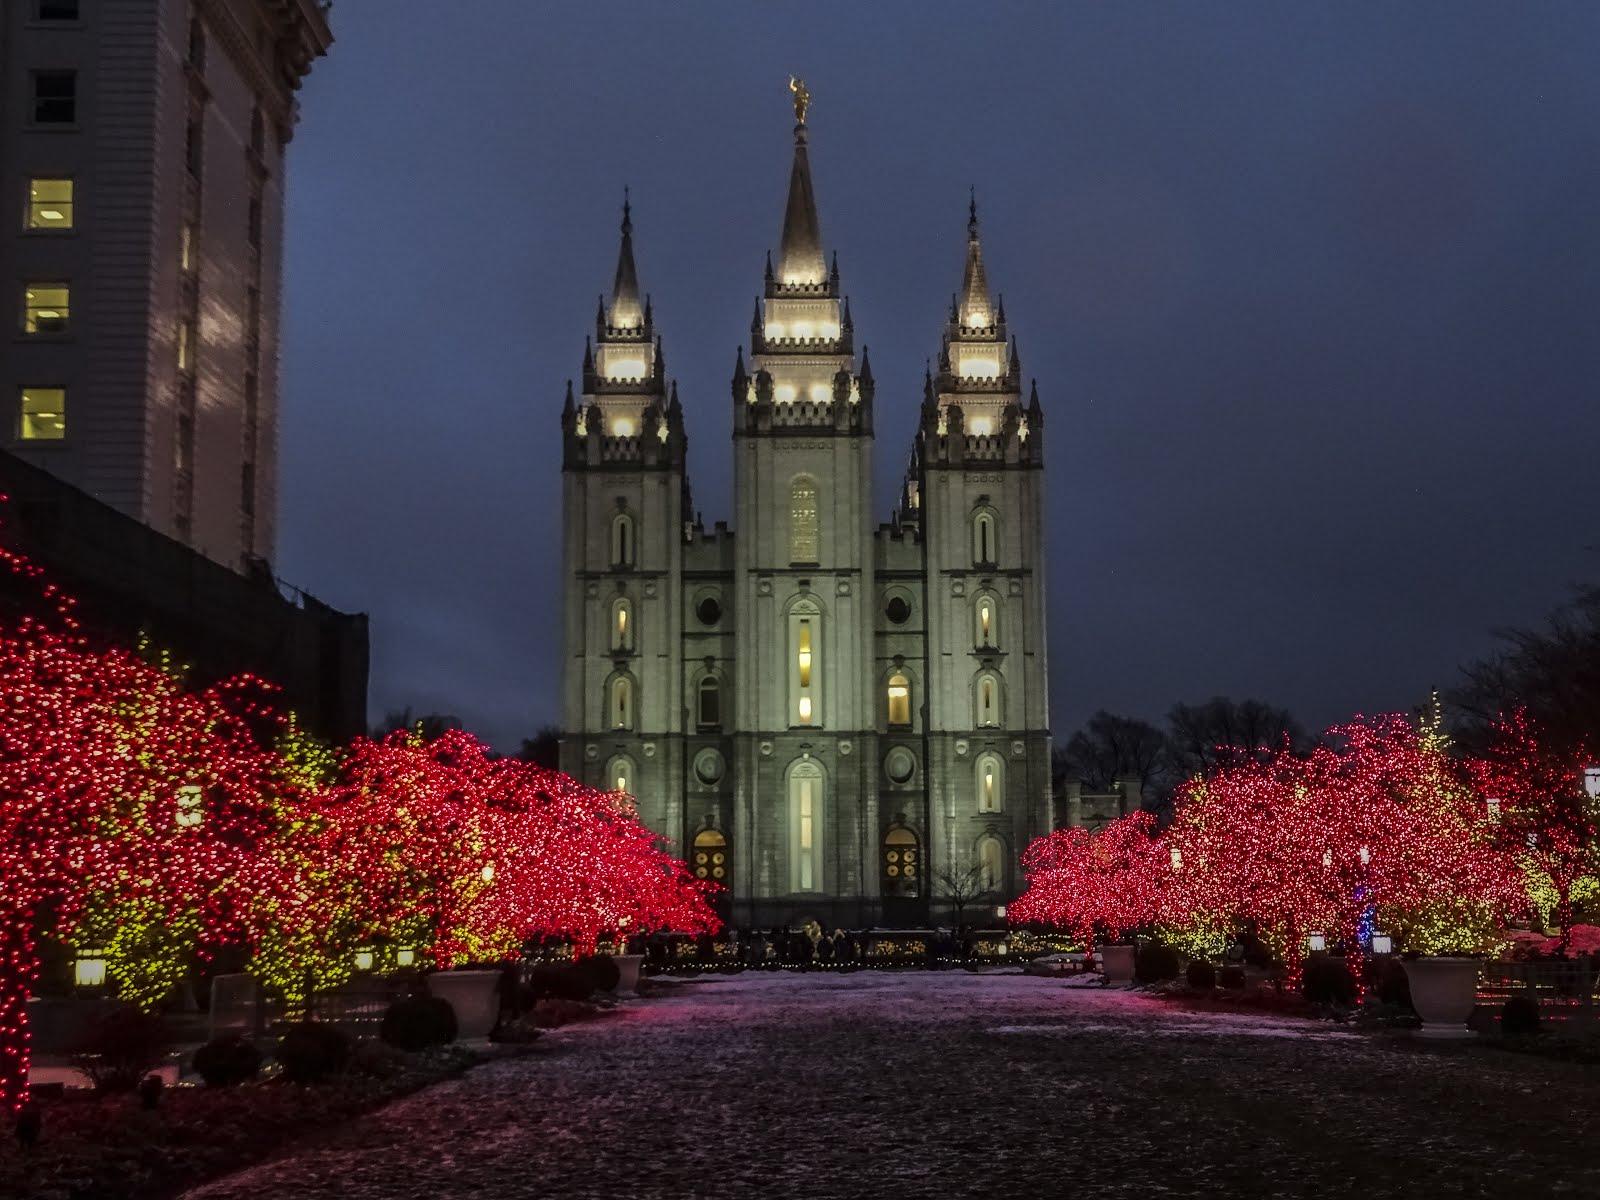 Temple Square Salt Lake City Christmas Lights.Walking Arizona Christmas Lights On Temple Square